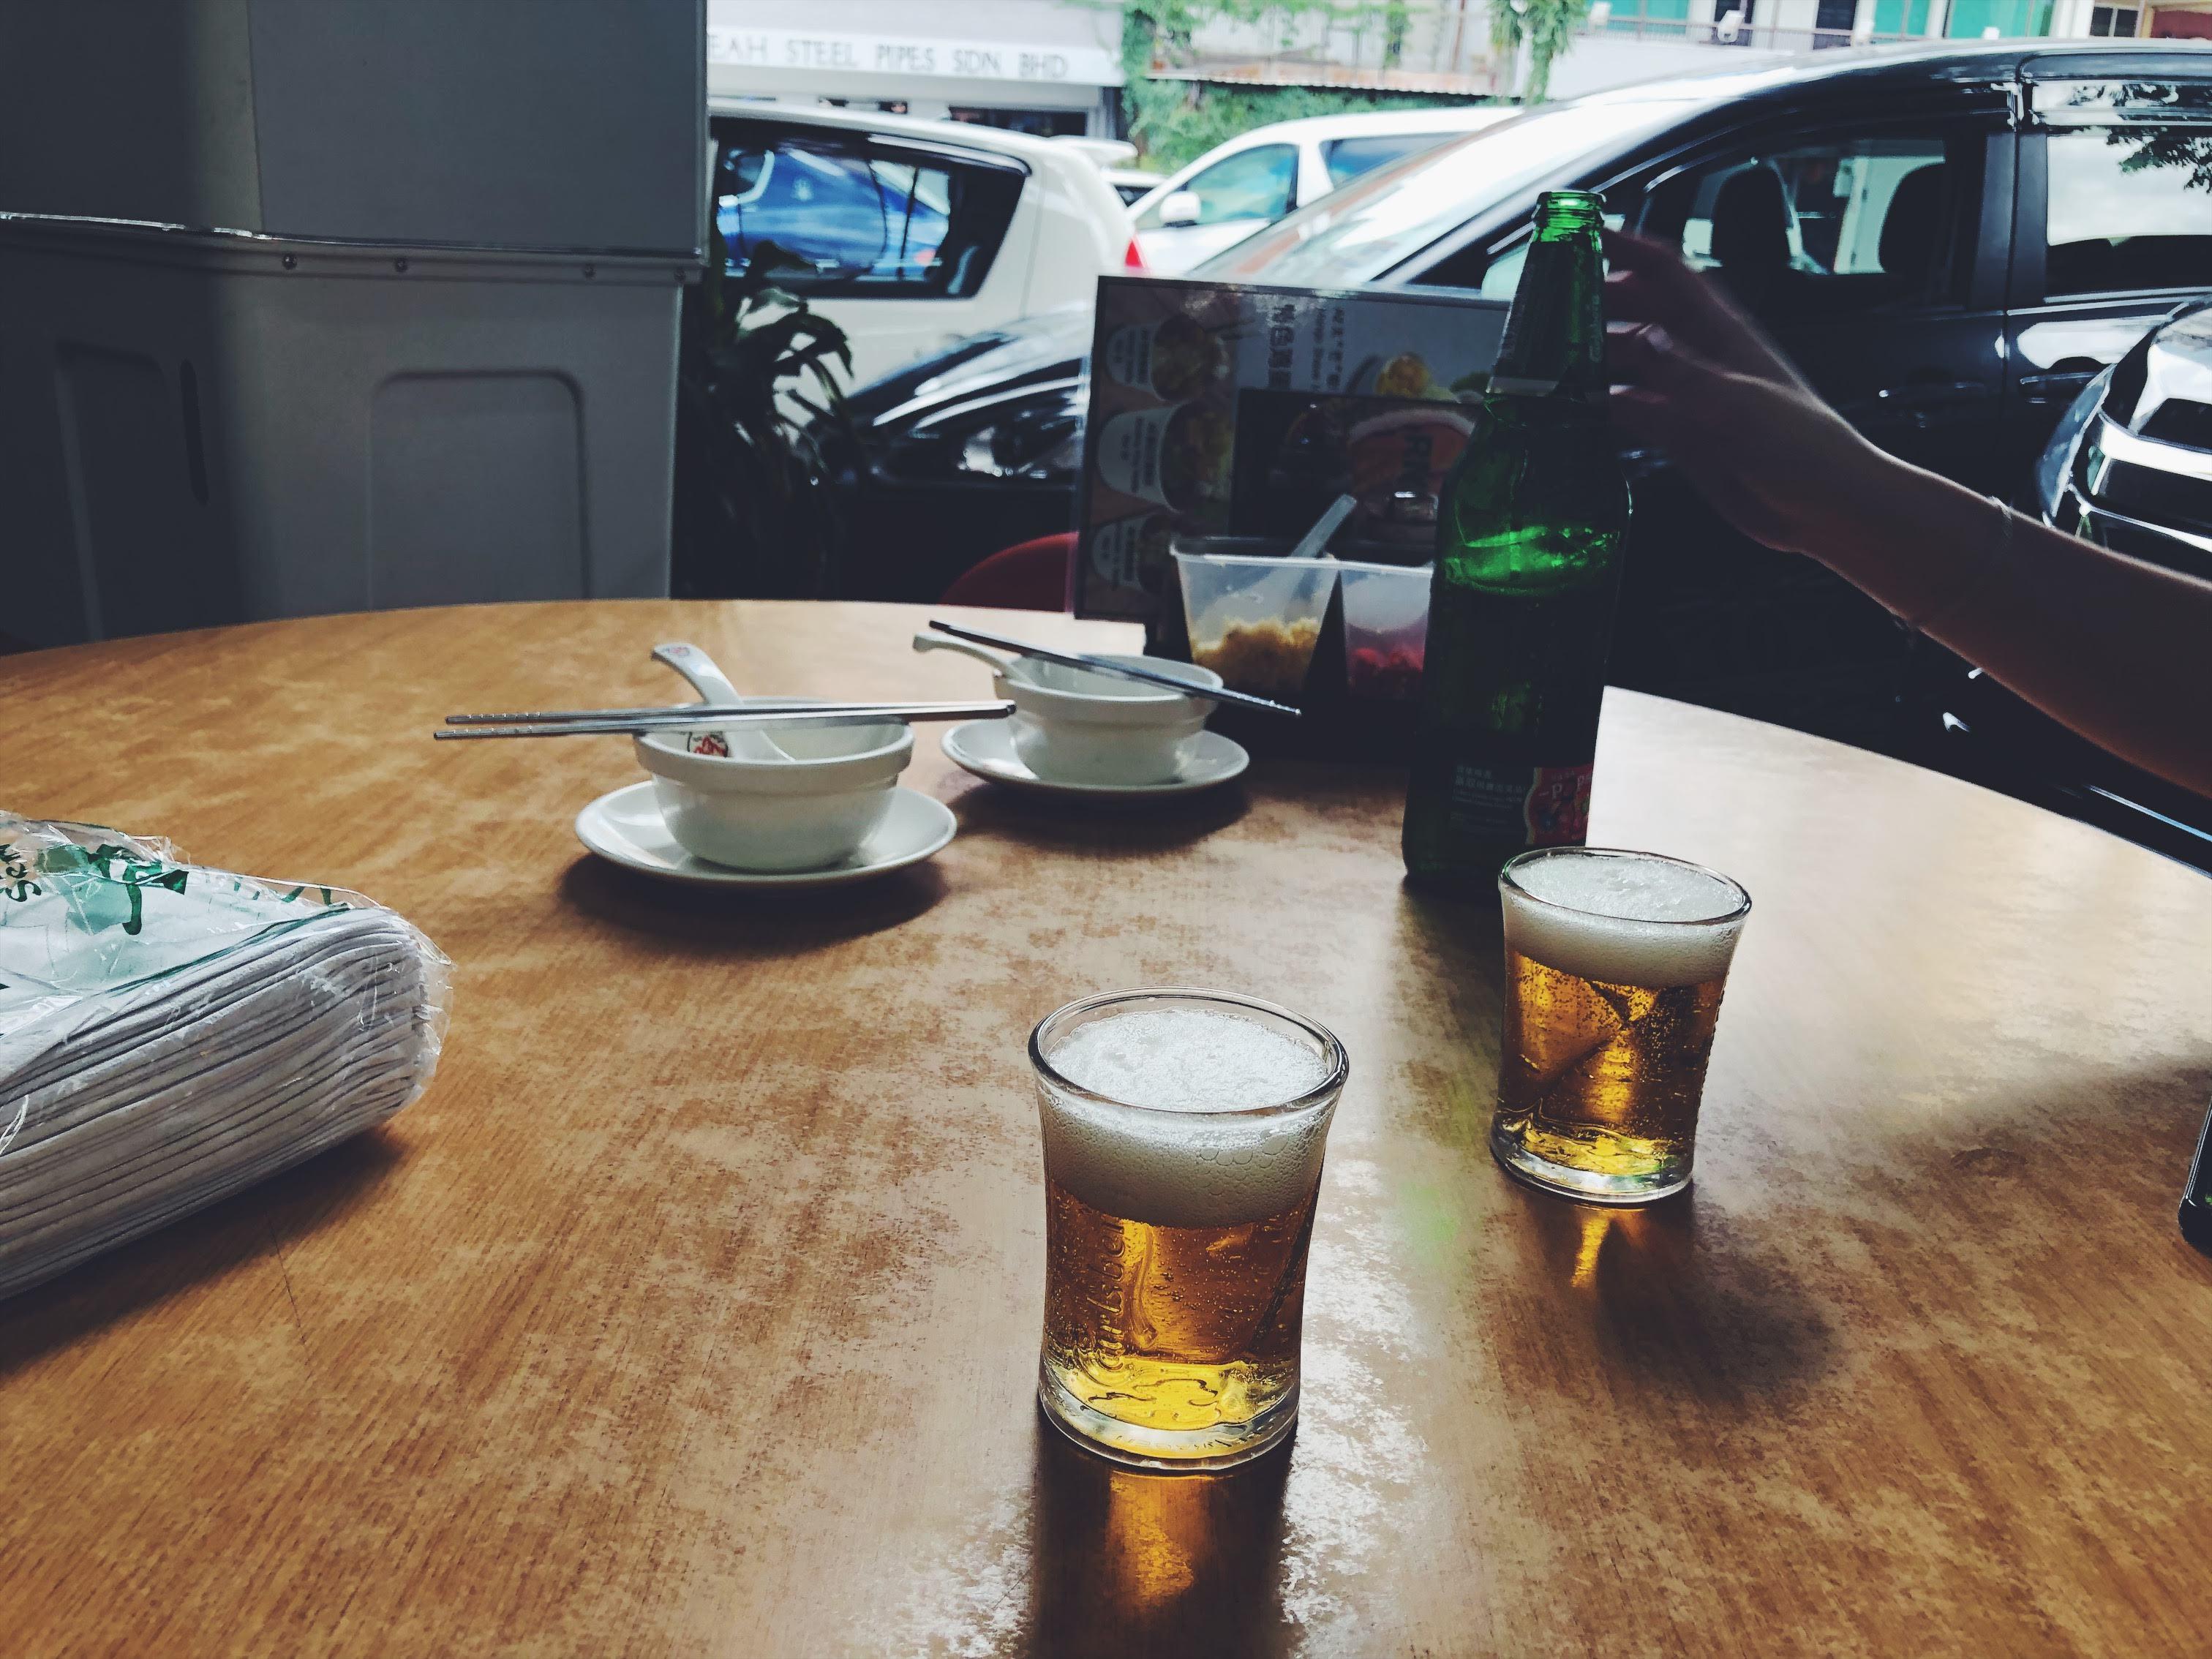 "Malaysia_BakKutTeh_Beer_011"""""